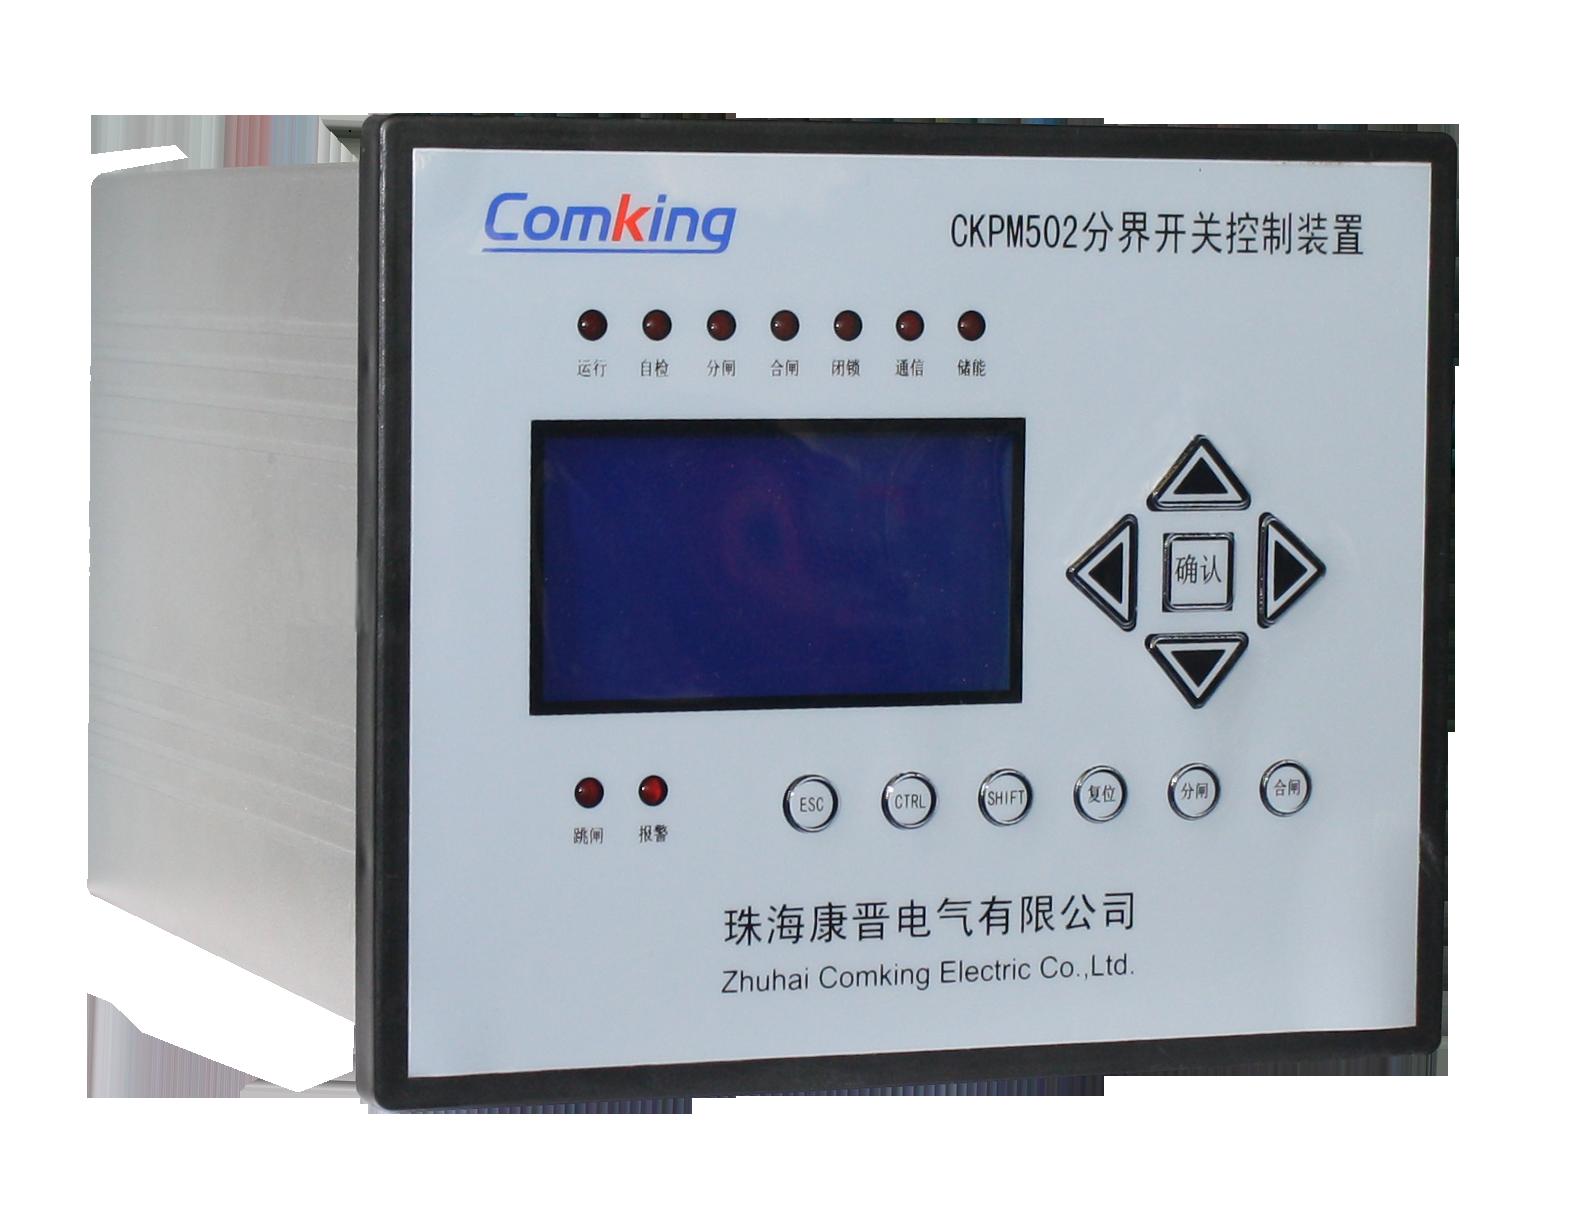 CKPM502分界开关控制装置